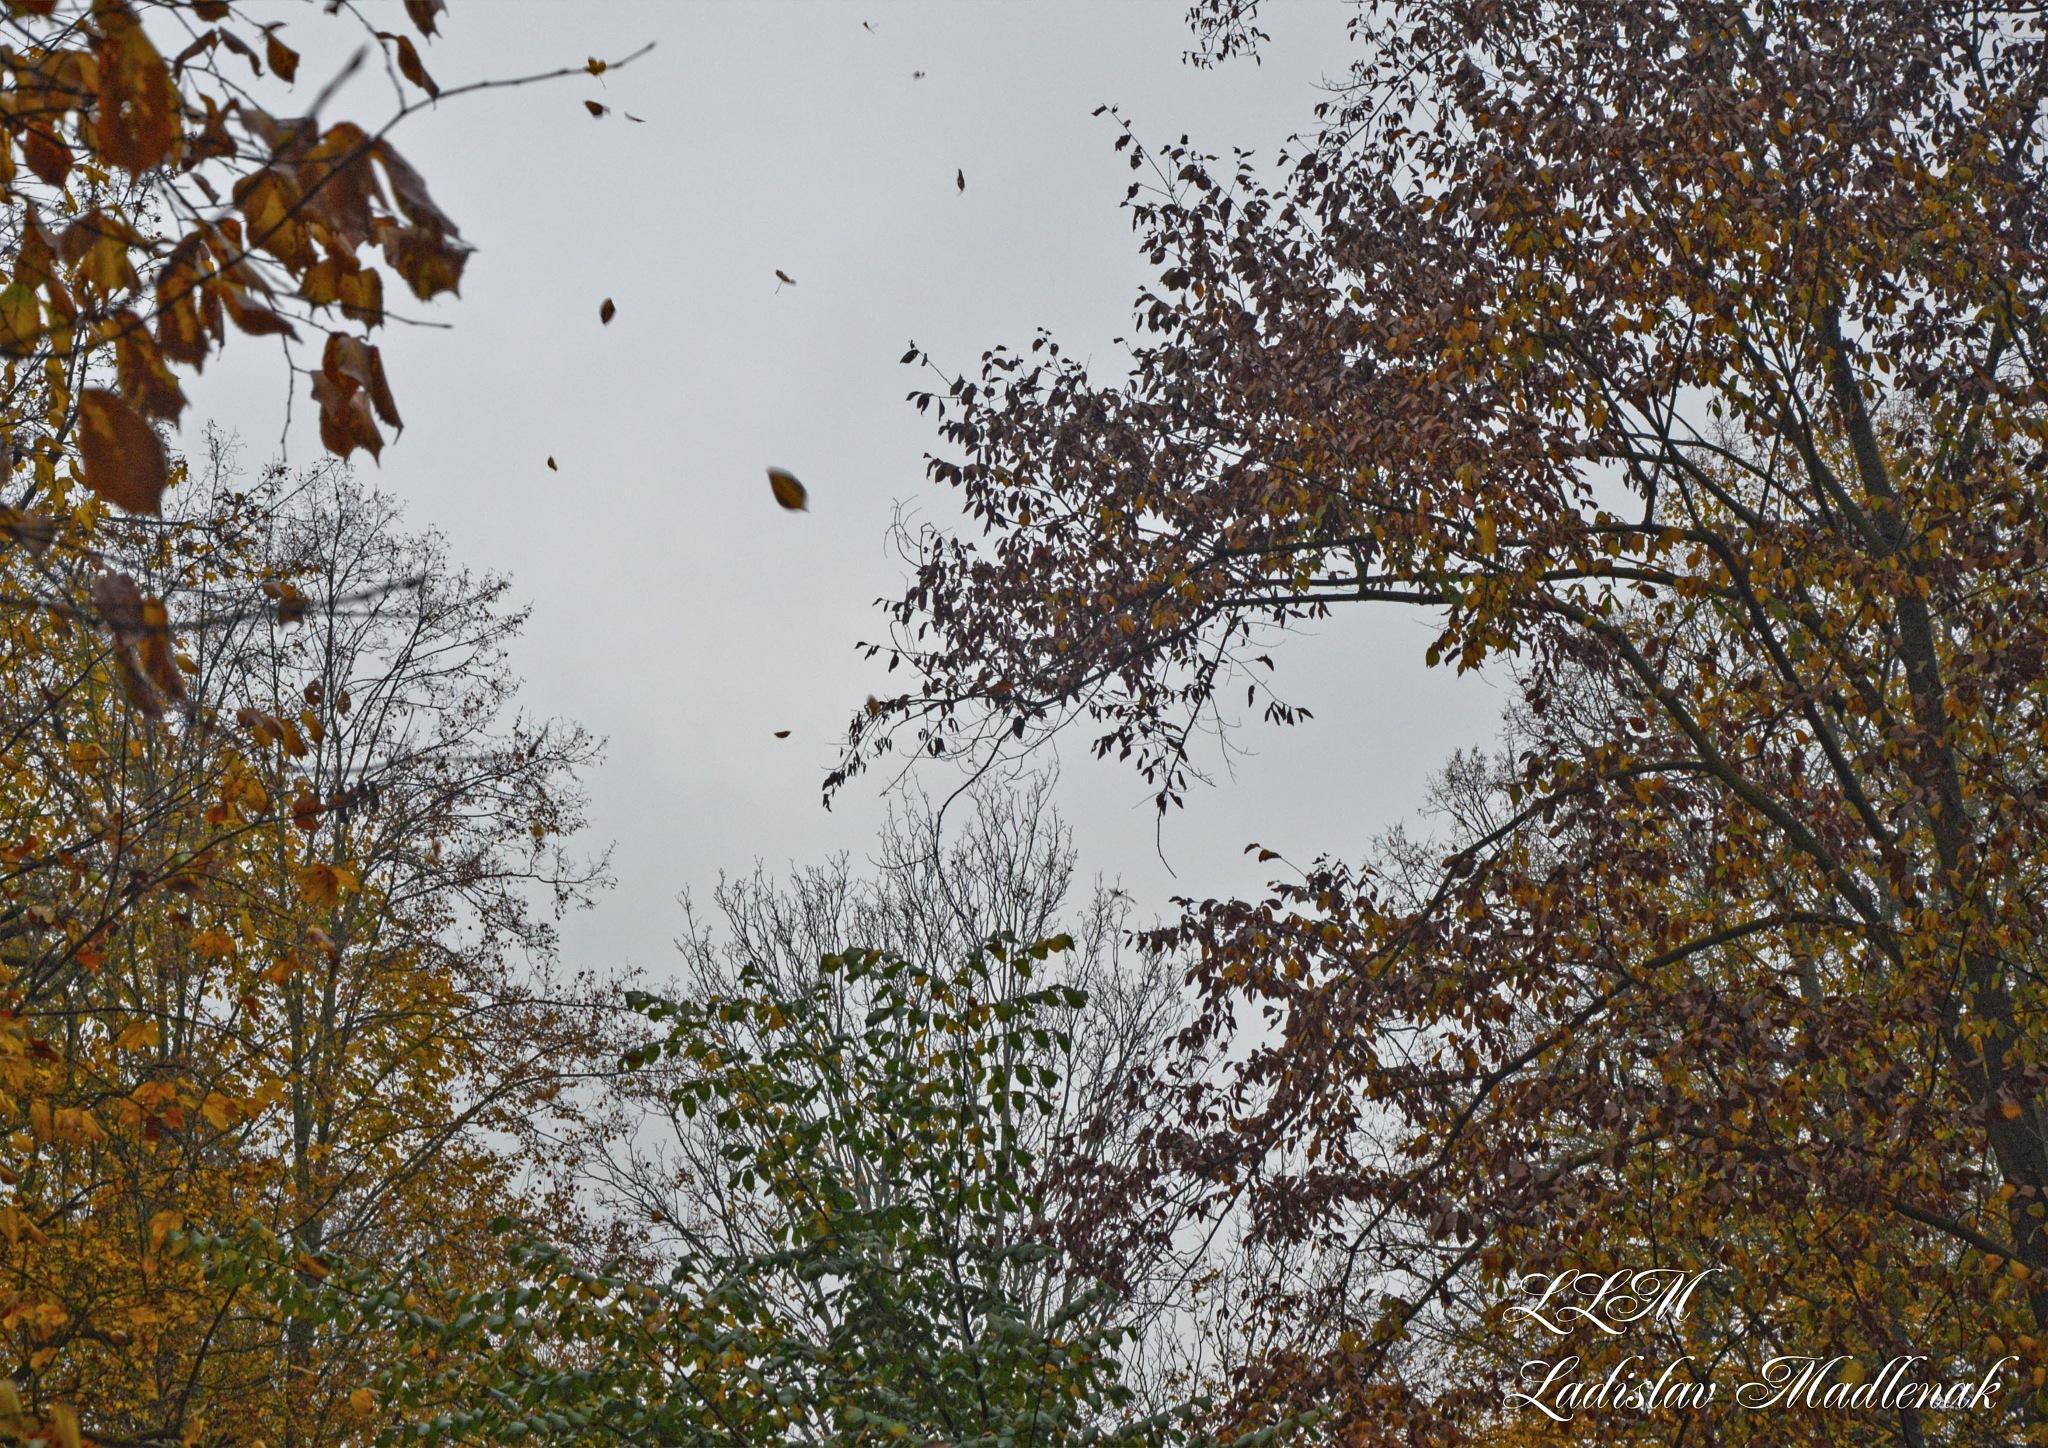 Autumn and flying foliage by LLadislav Madlenak